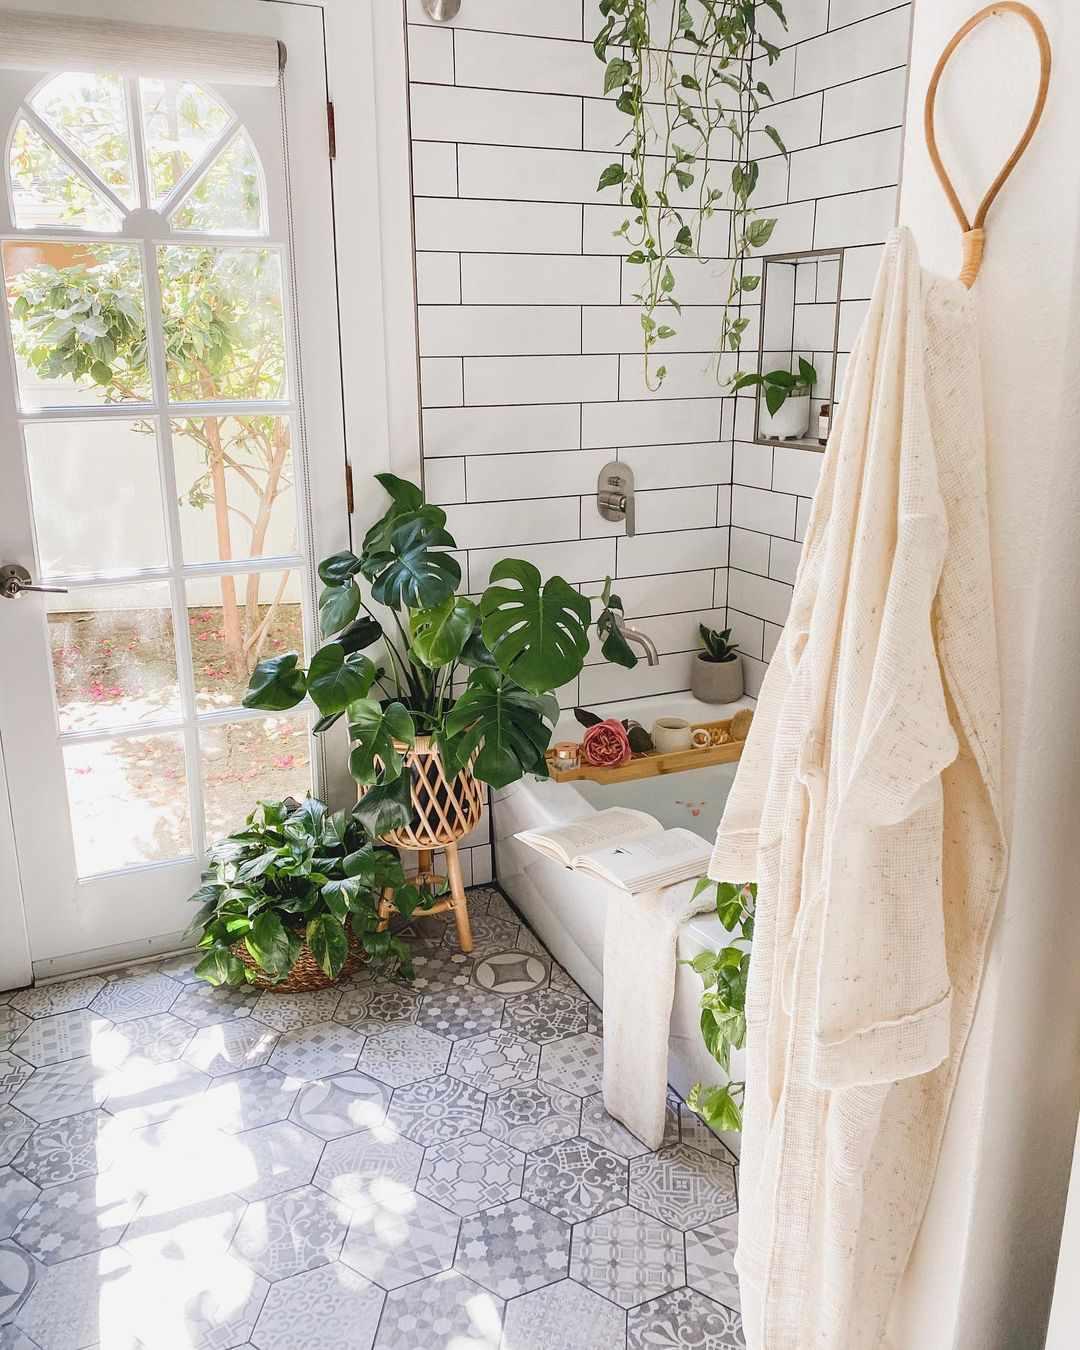 Plants in sunny bathroom.